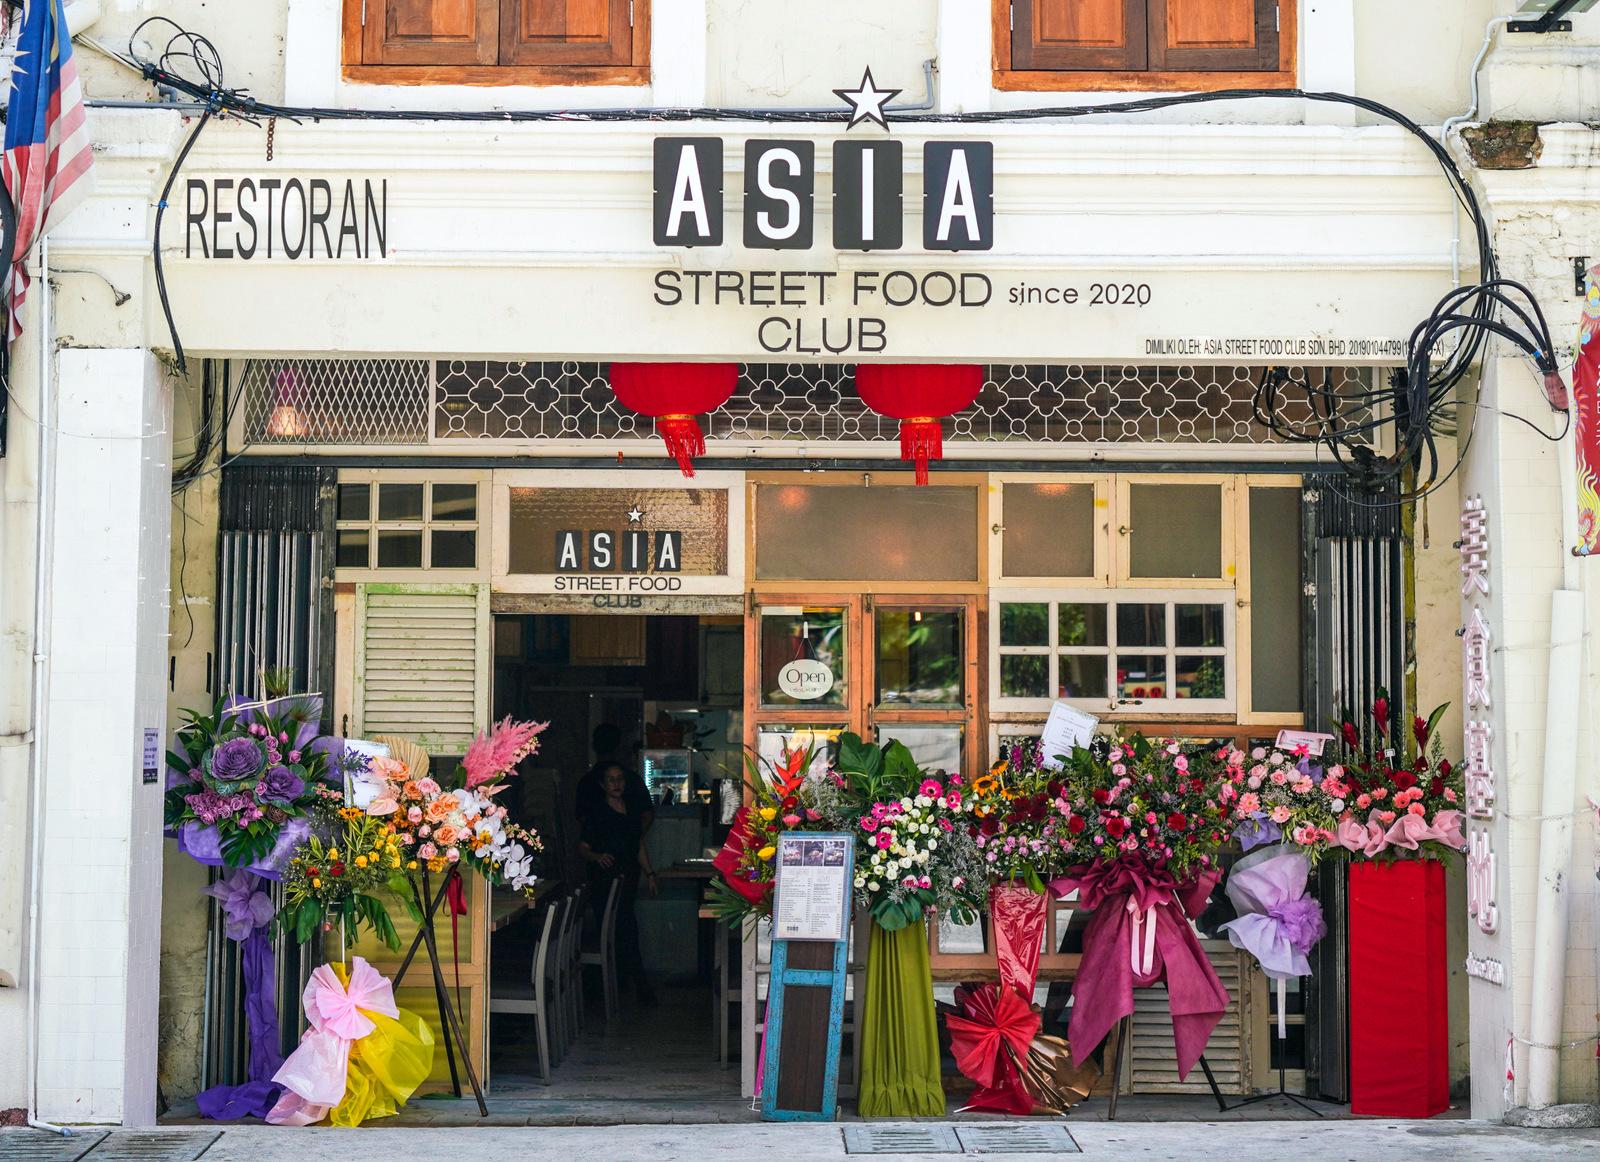 asia street food club, petaling street